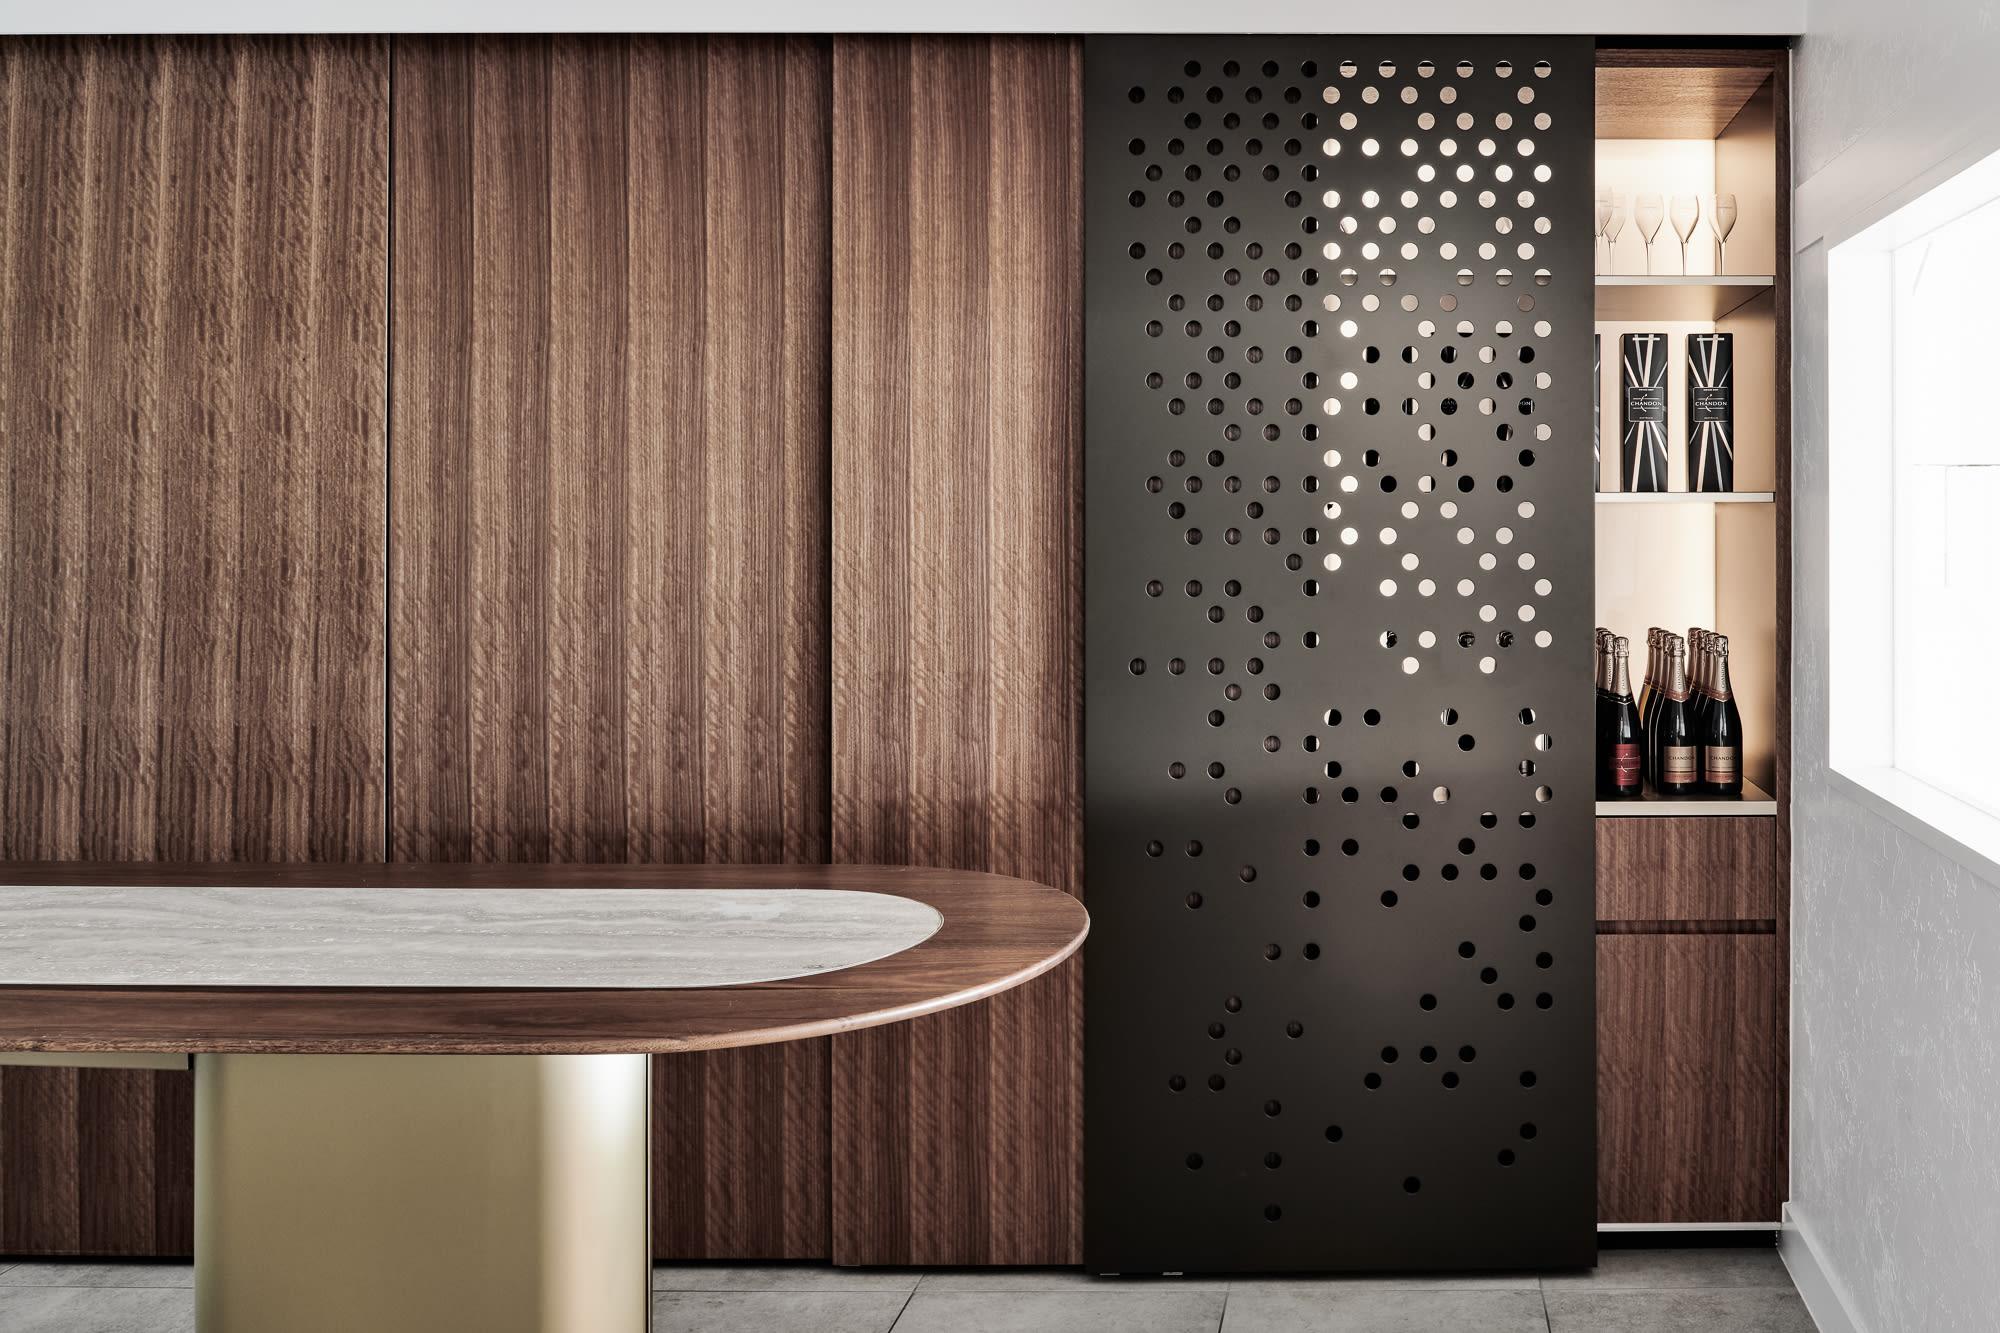 Interior Design by Foolscap Studio at Domaine Chandon, Coldstream - Interior Design